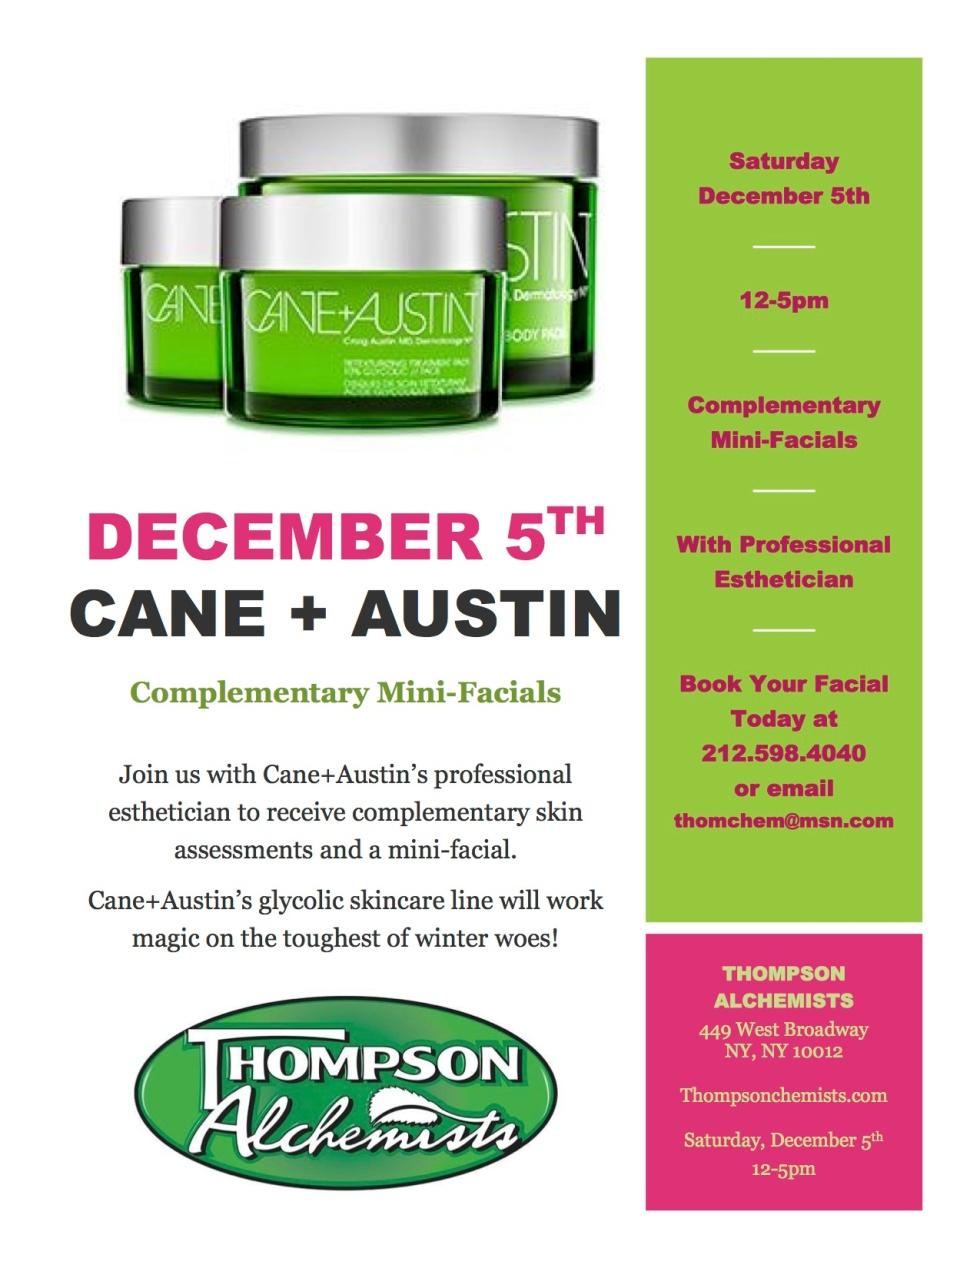 Cane+Austin Skincare